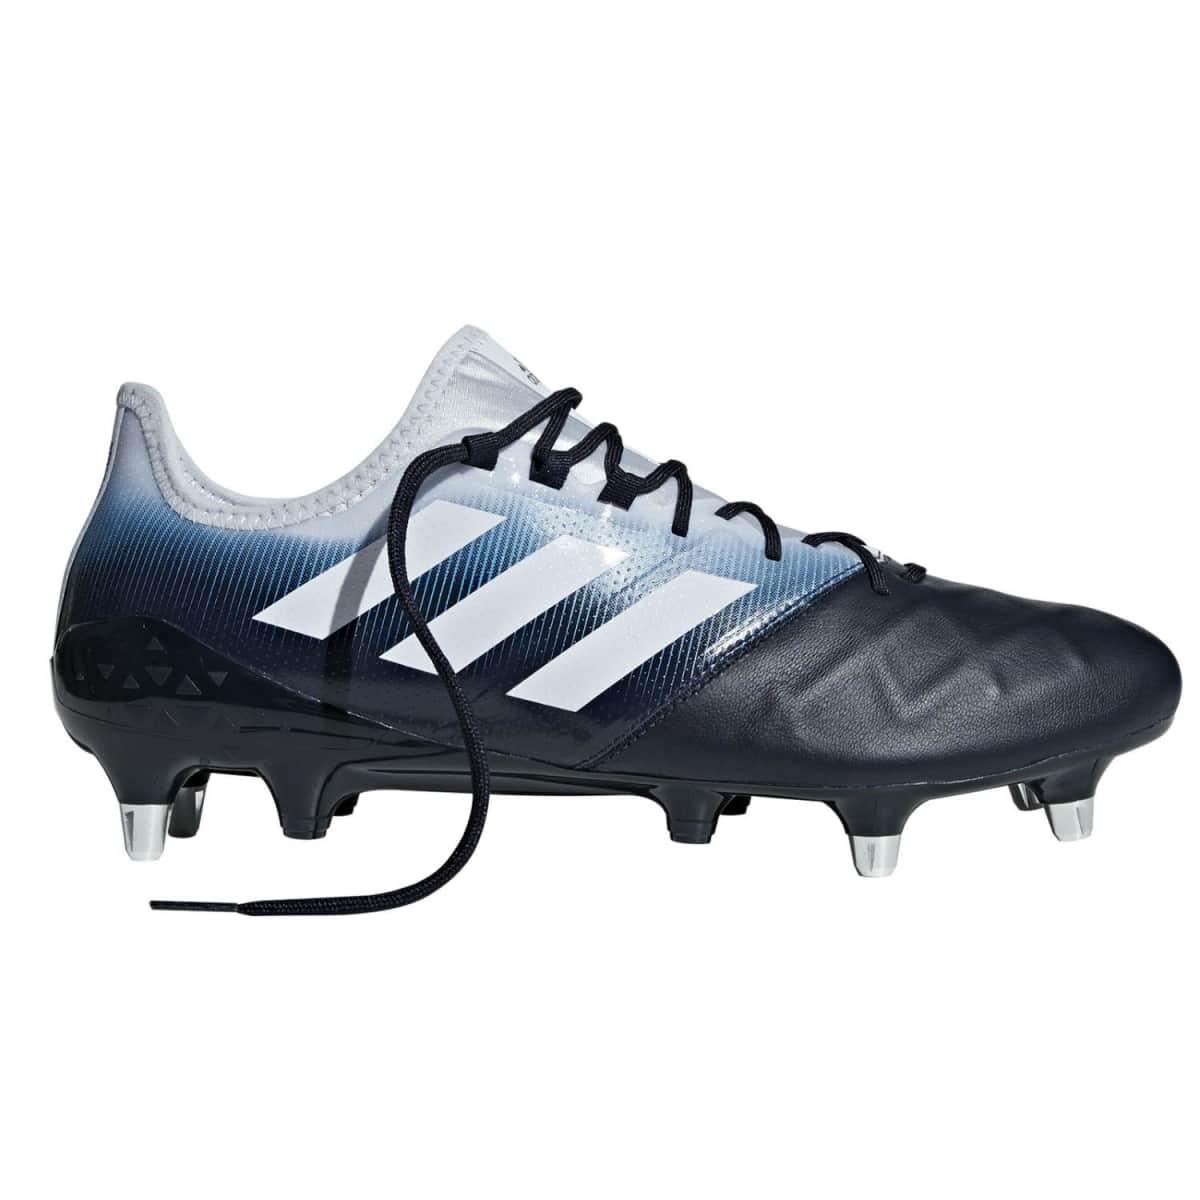 adidas Kakari Light SG Rugby Boots adbe51a4c